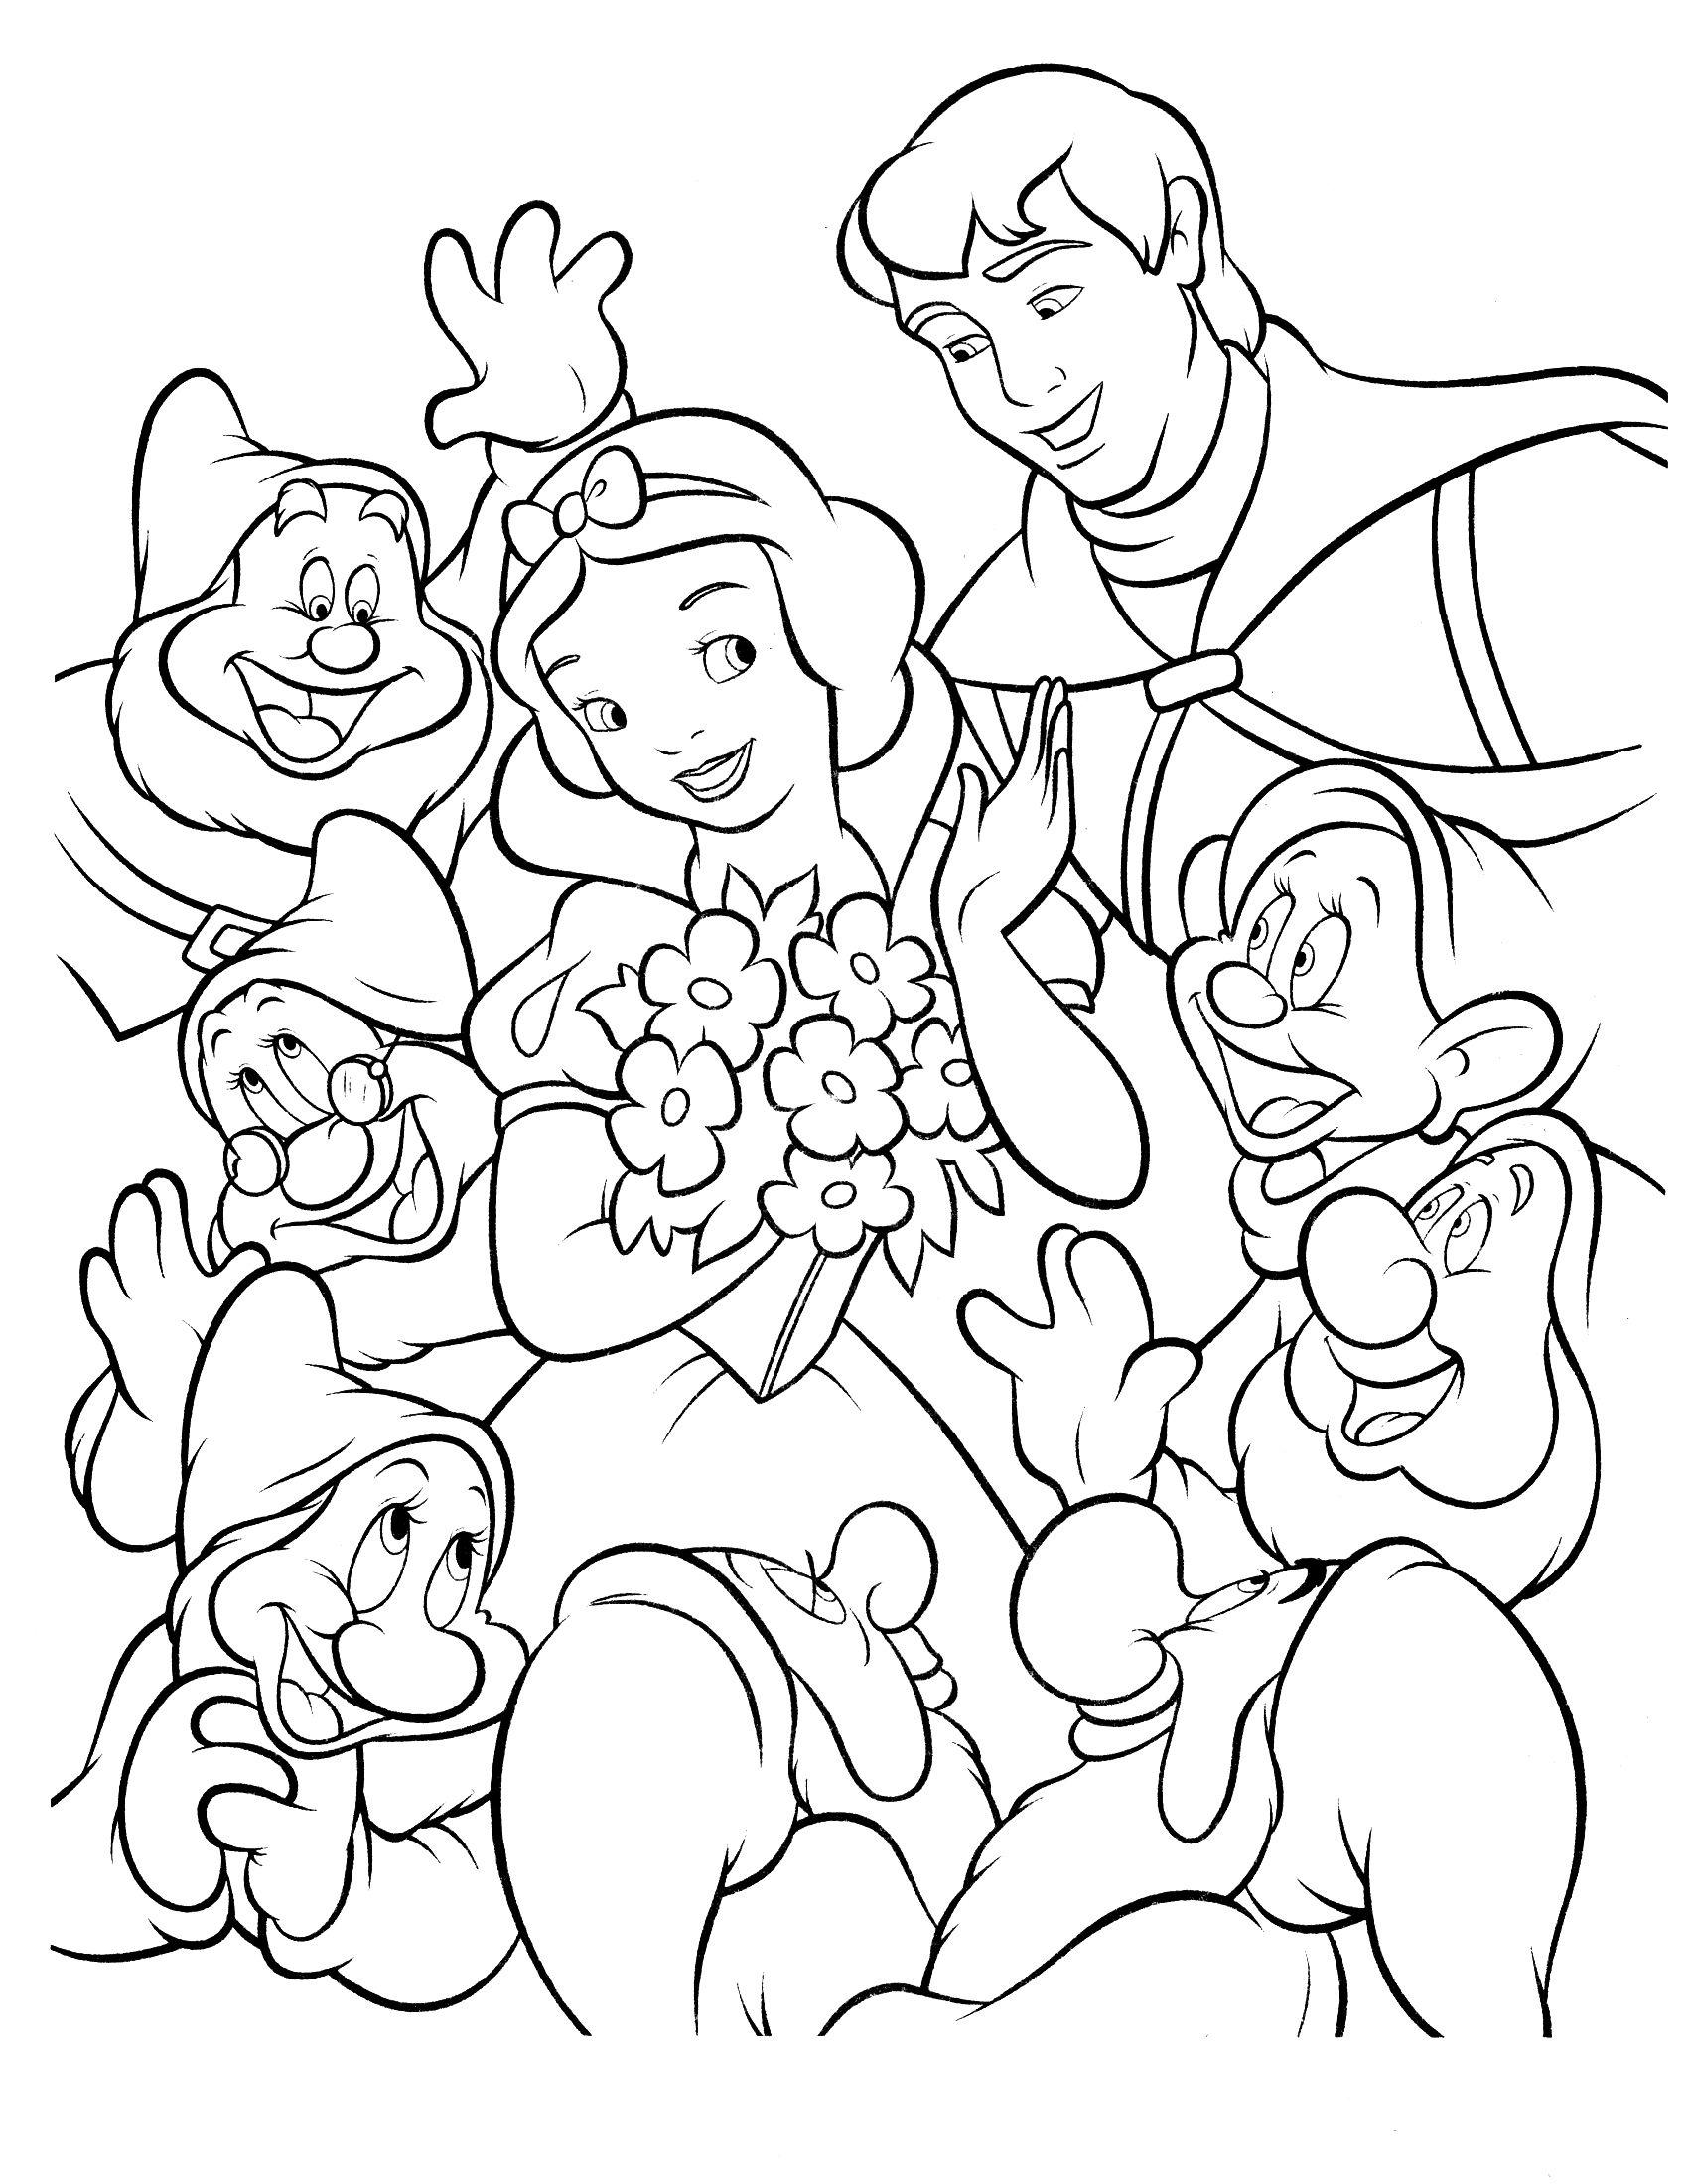 Snow White Coloring Page 16 Jpg 1700 2200 Disney Kleurplaten Sneeuwwitje Kleurplaten